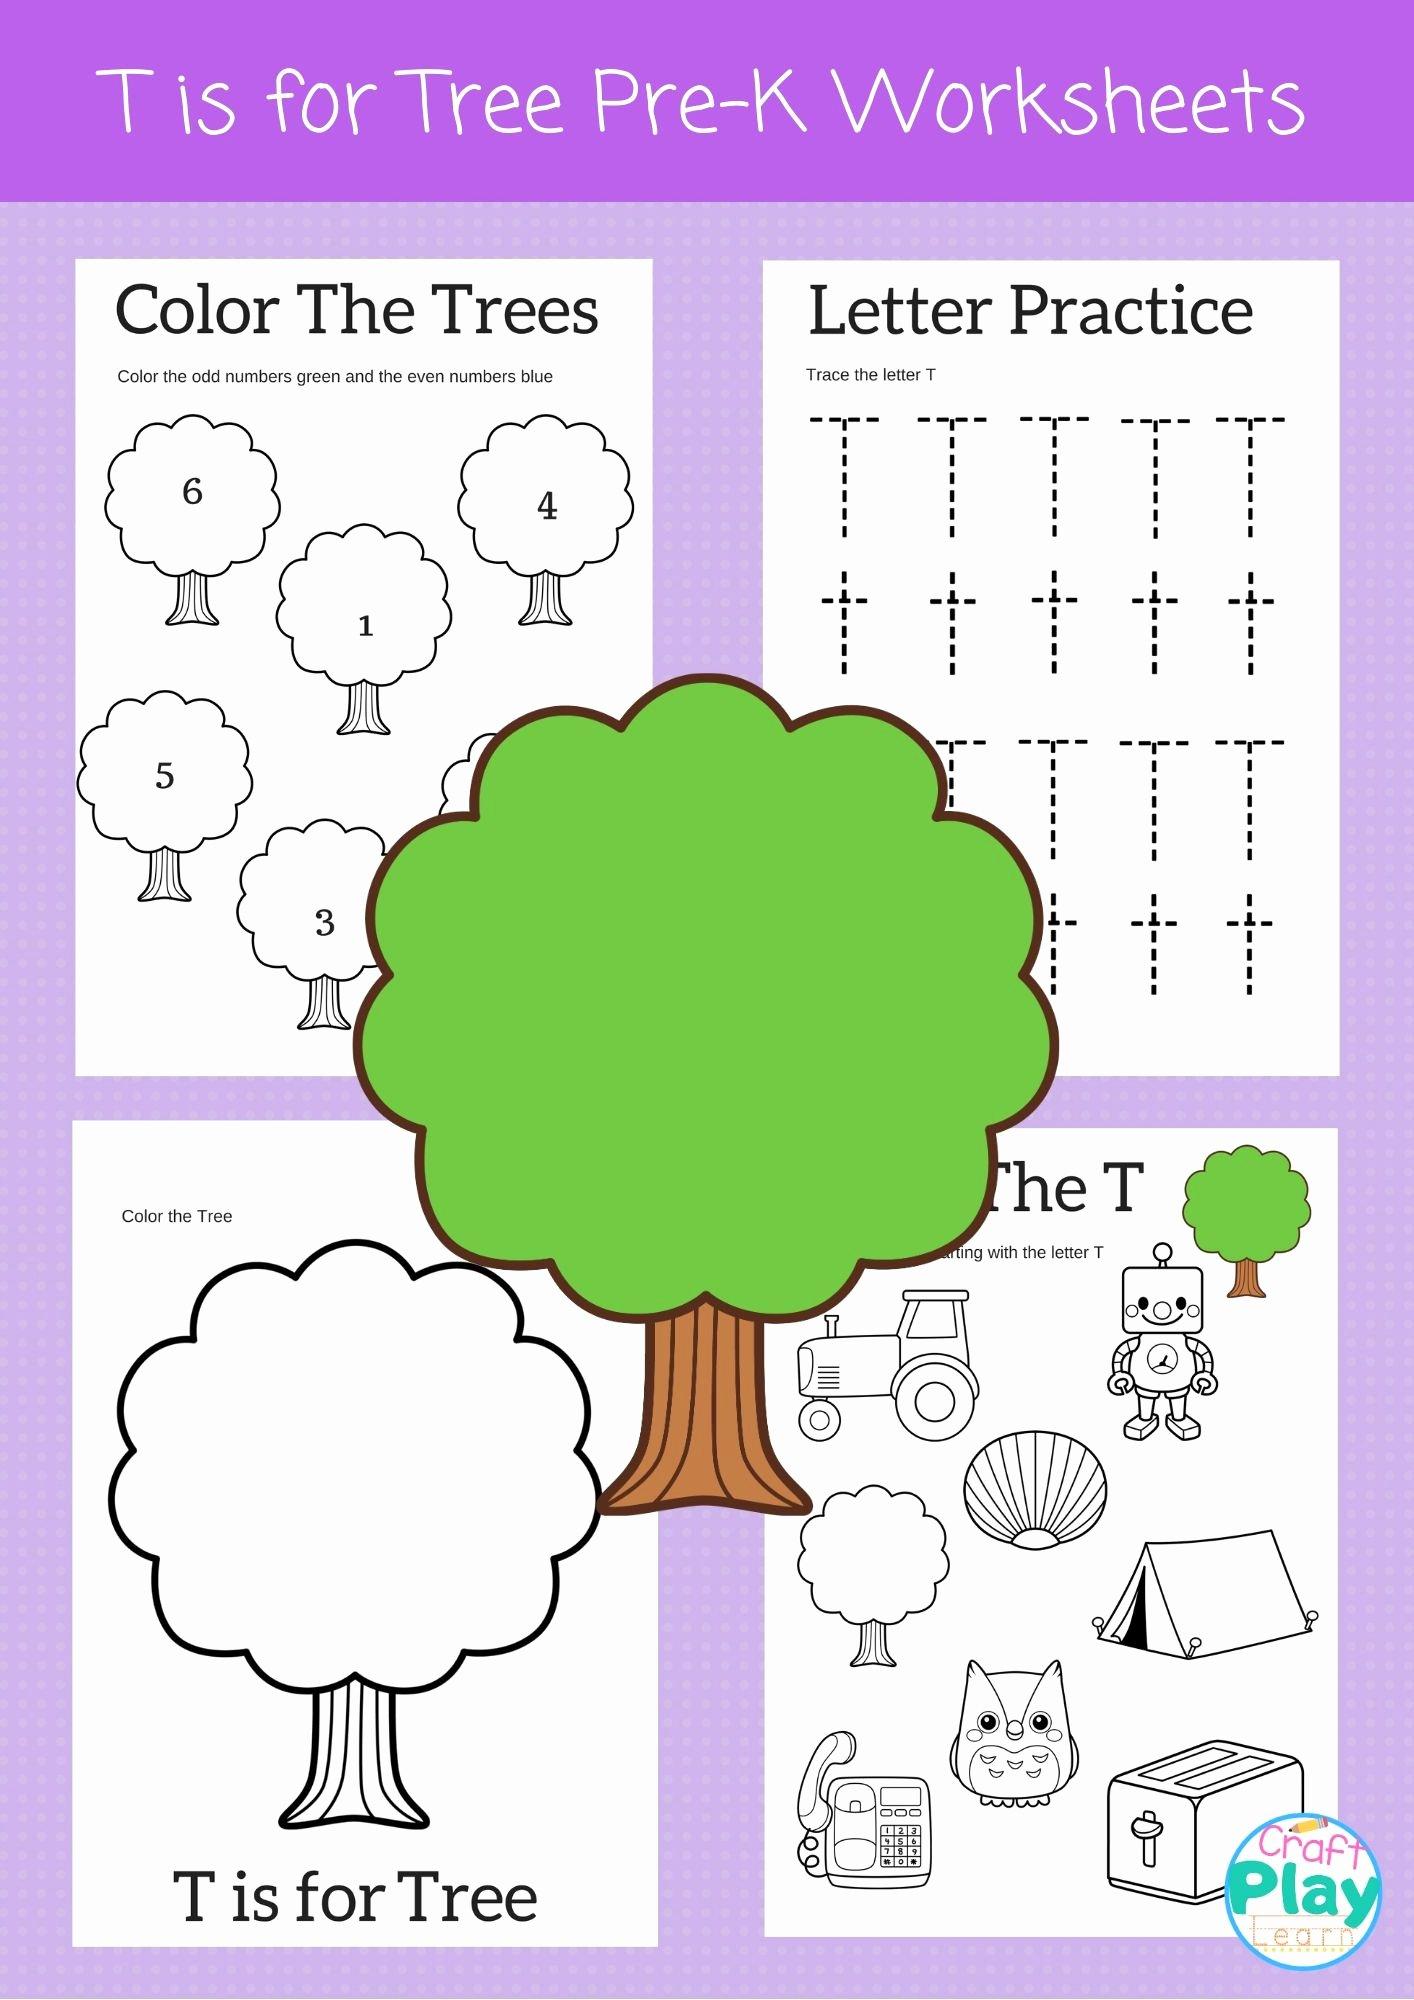 Letter T Worksheets for Preschoolers Beautiful Letter T Worksheets for Preschool Kids Craft Play Learn